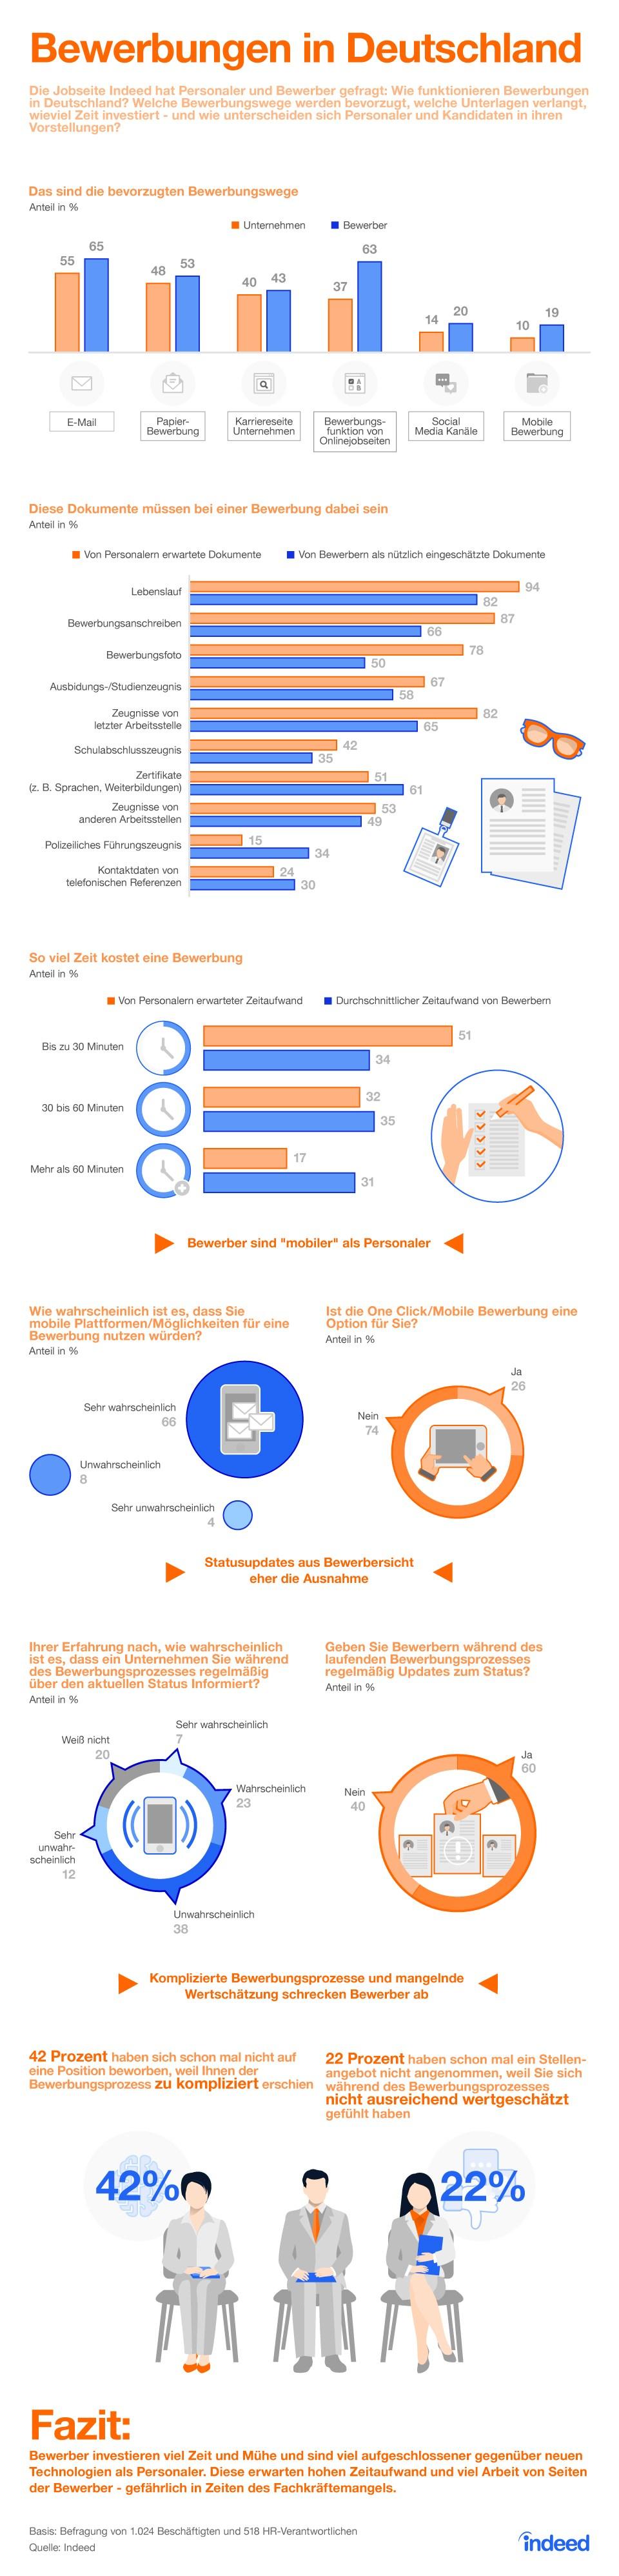 infografik indeed bewerber personalabteilung bewerbungen